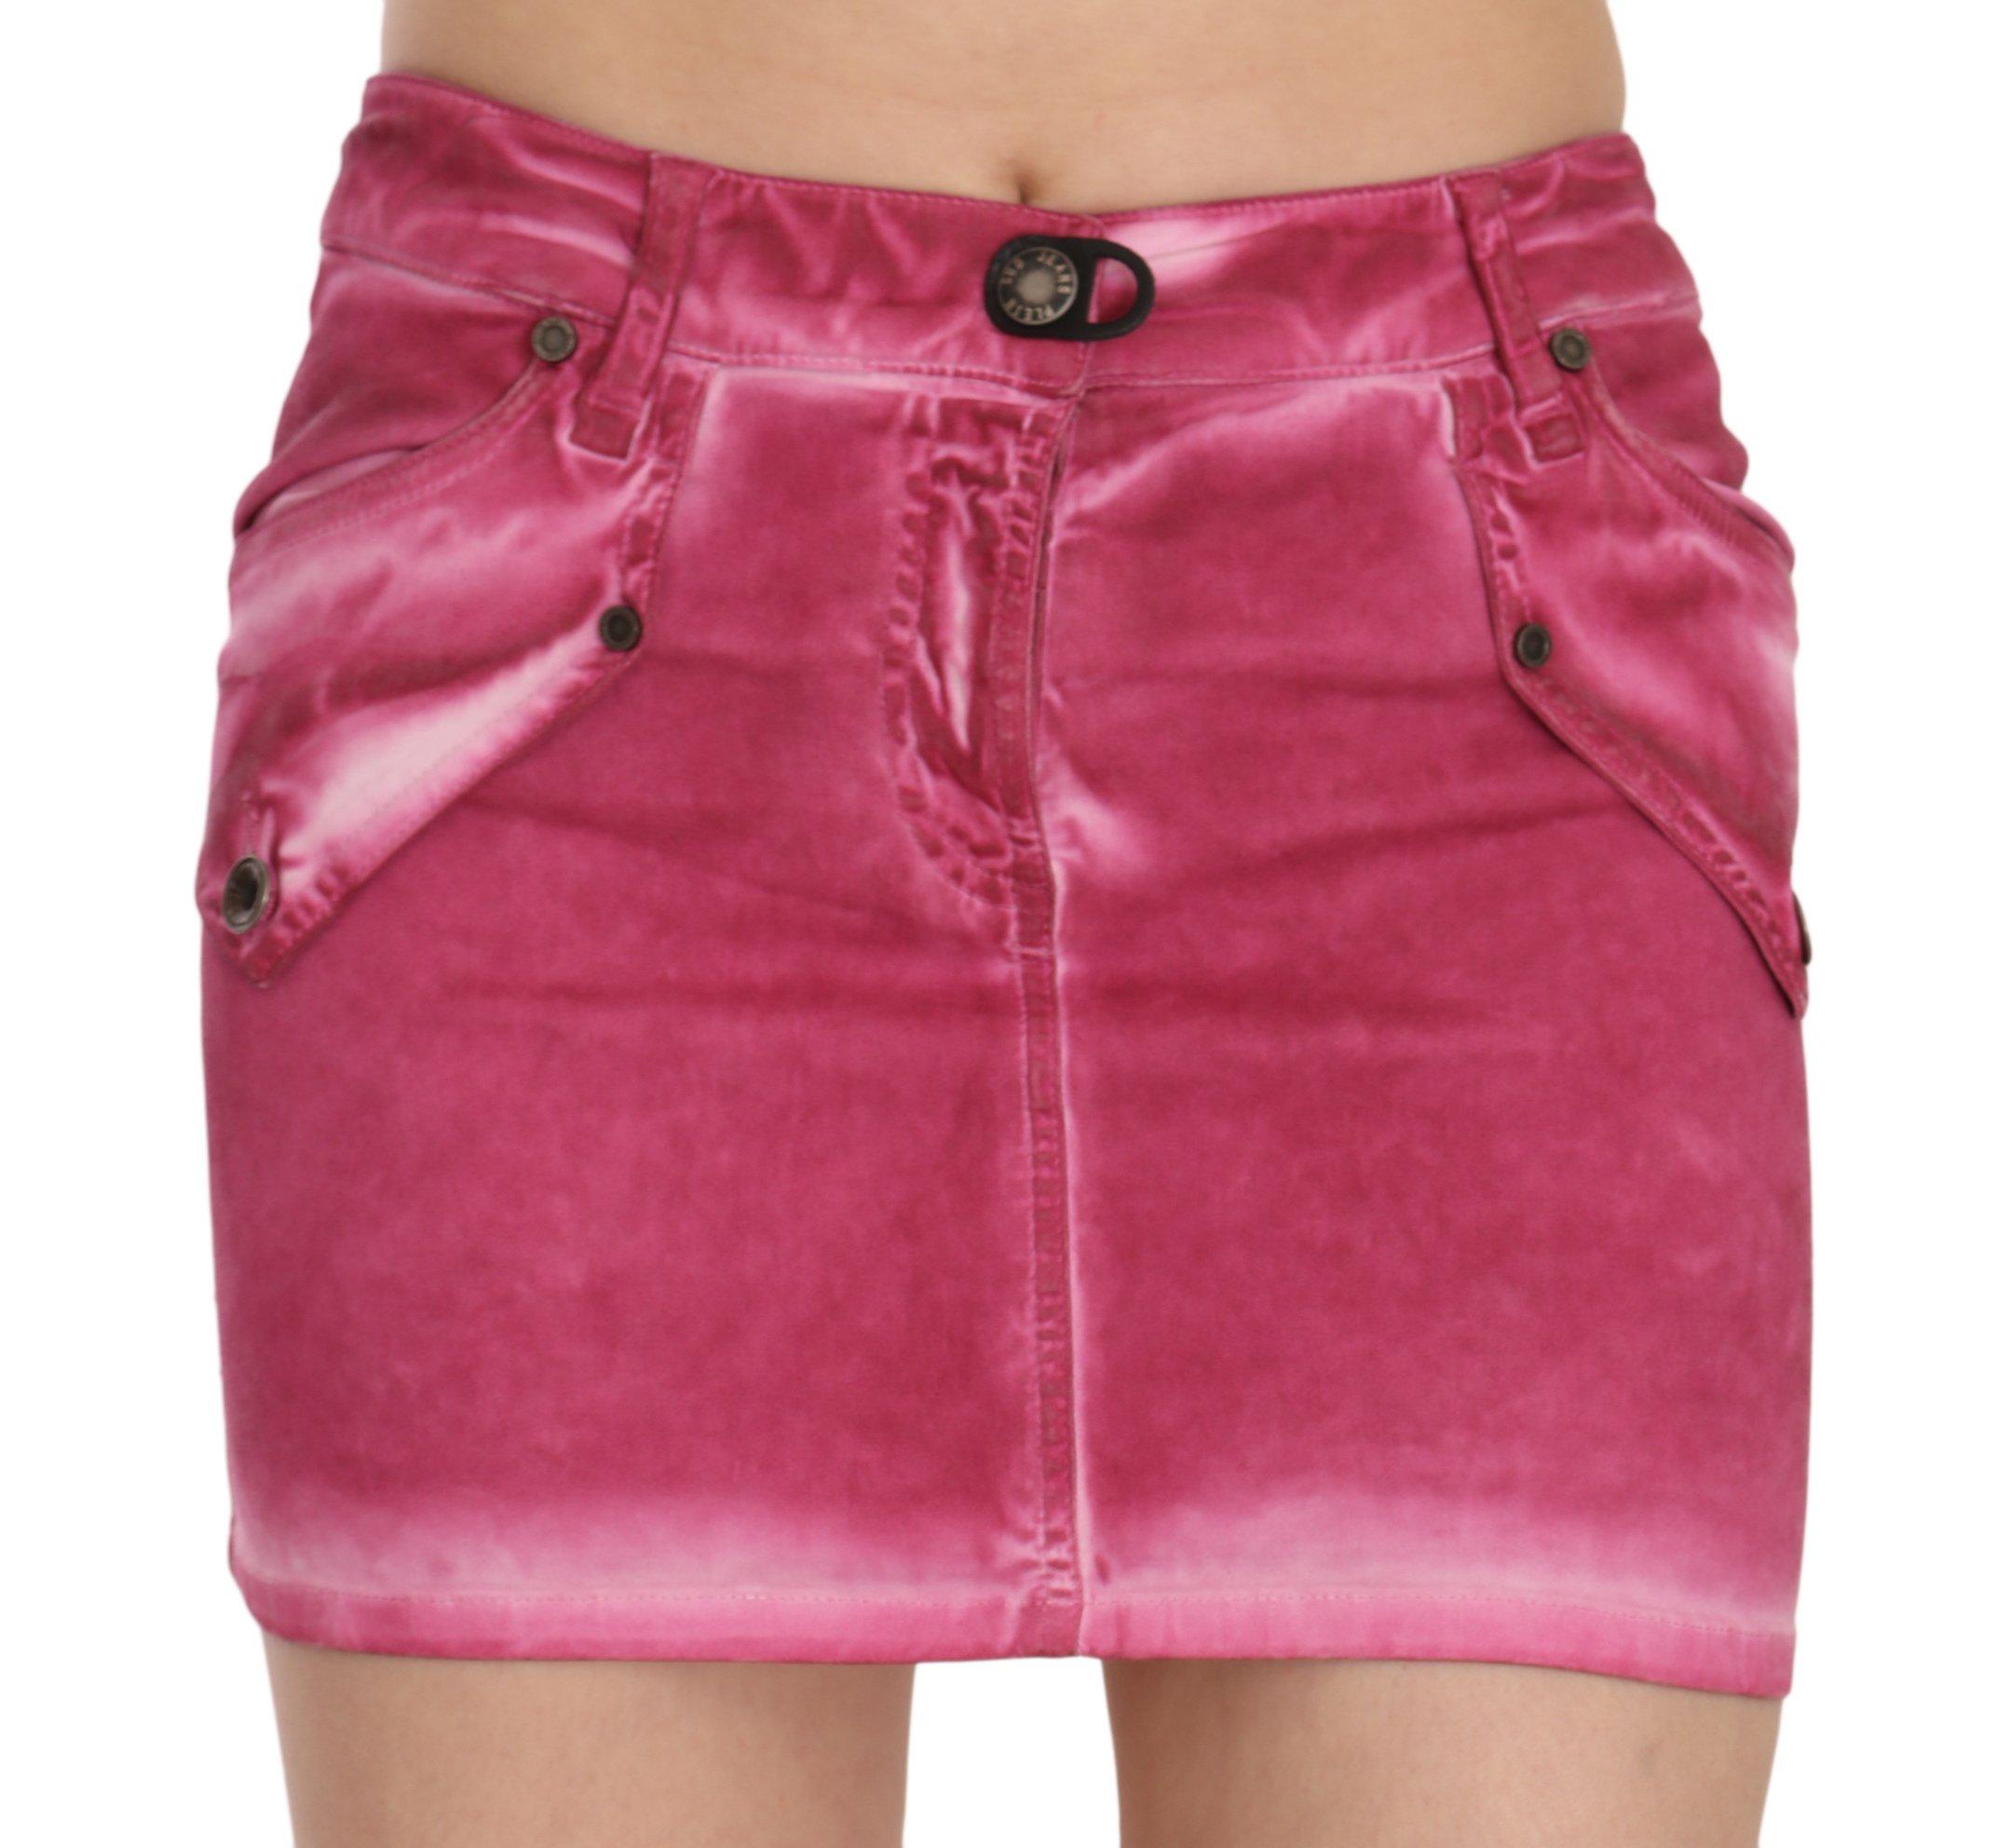 PLEIN SUD Women's Cotton Stretch Casual Mini Skirt Pink PAN70248 - IT36|XXS